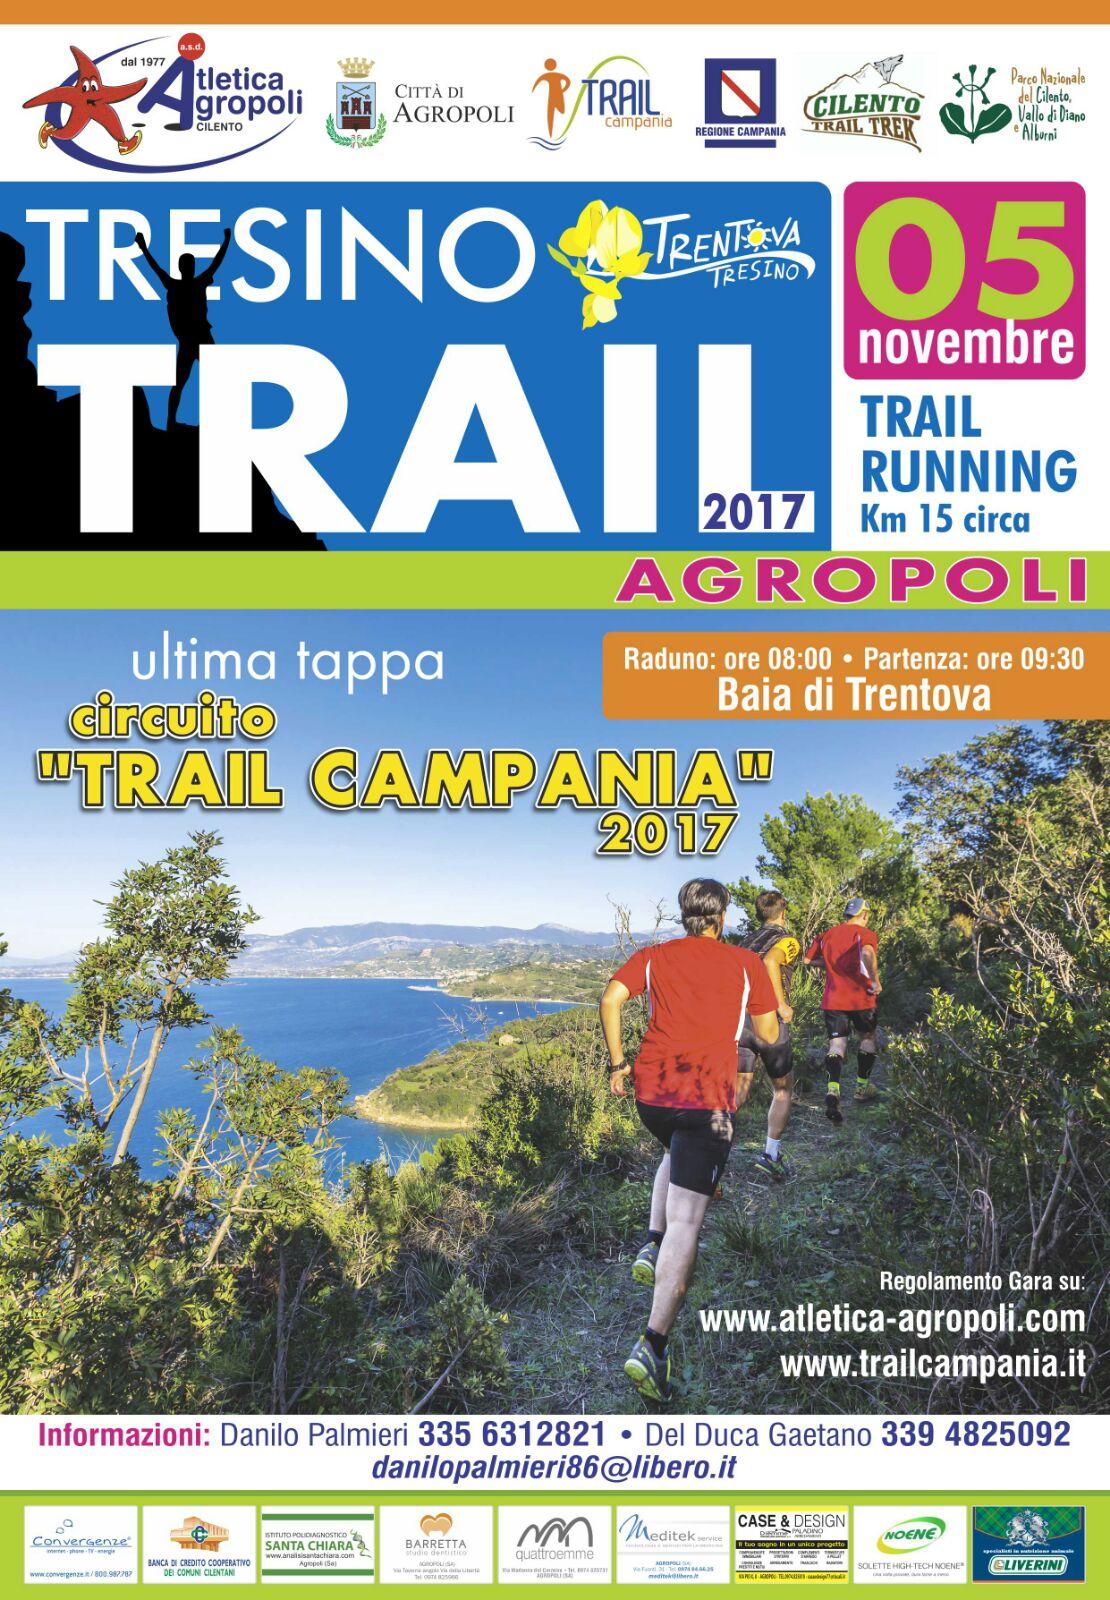 Tresino Trail 2017